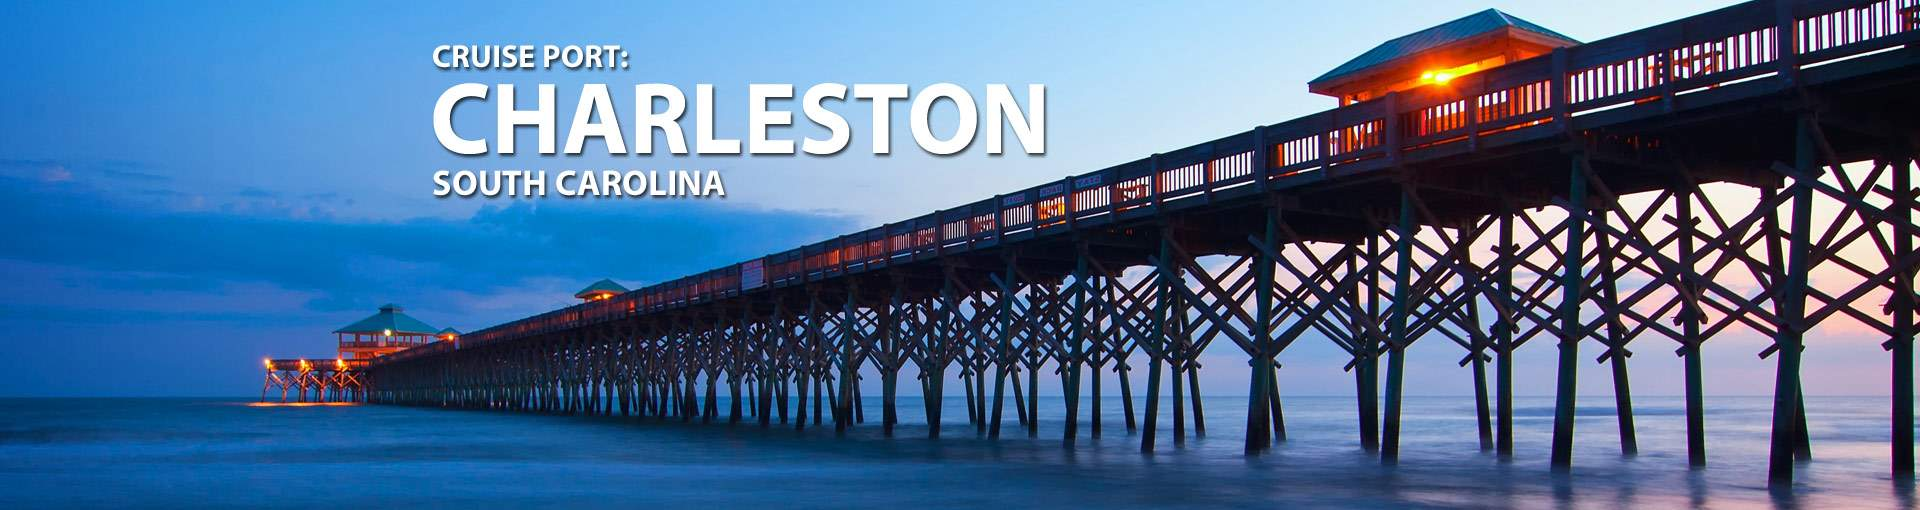 Charleston South Carolina Cruise Port And Cruises From - Charleston sc cruise port